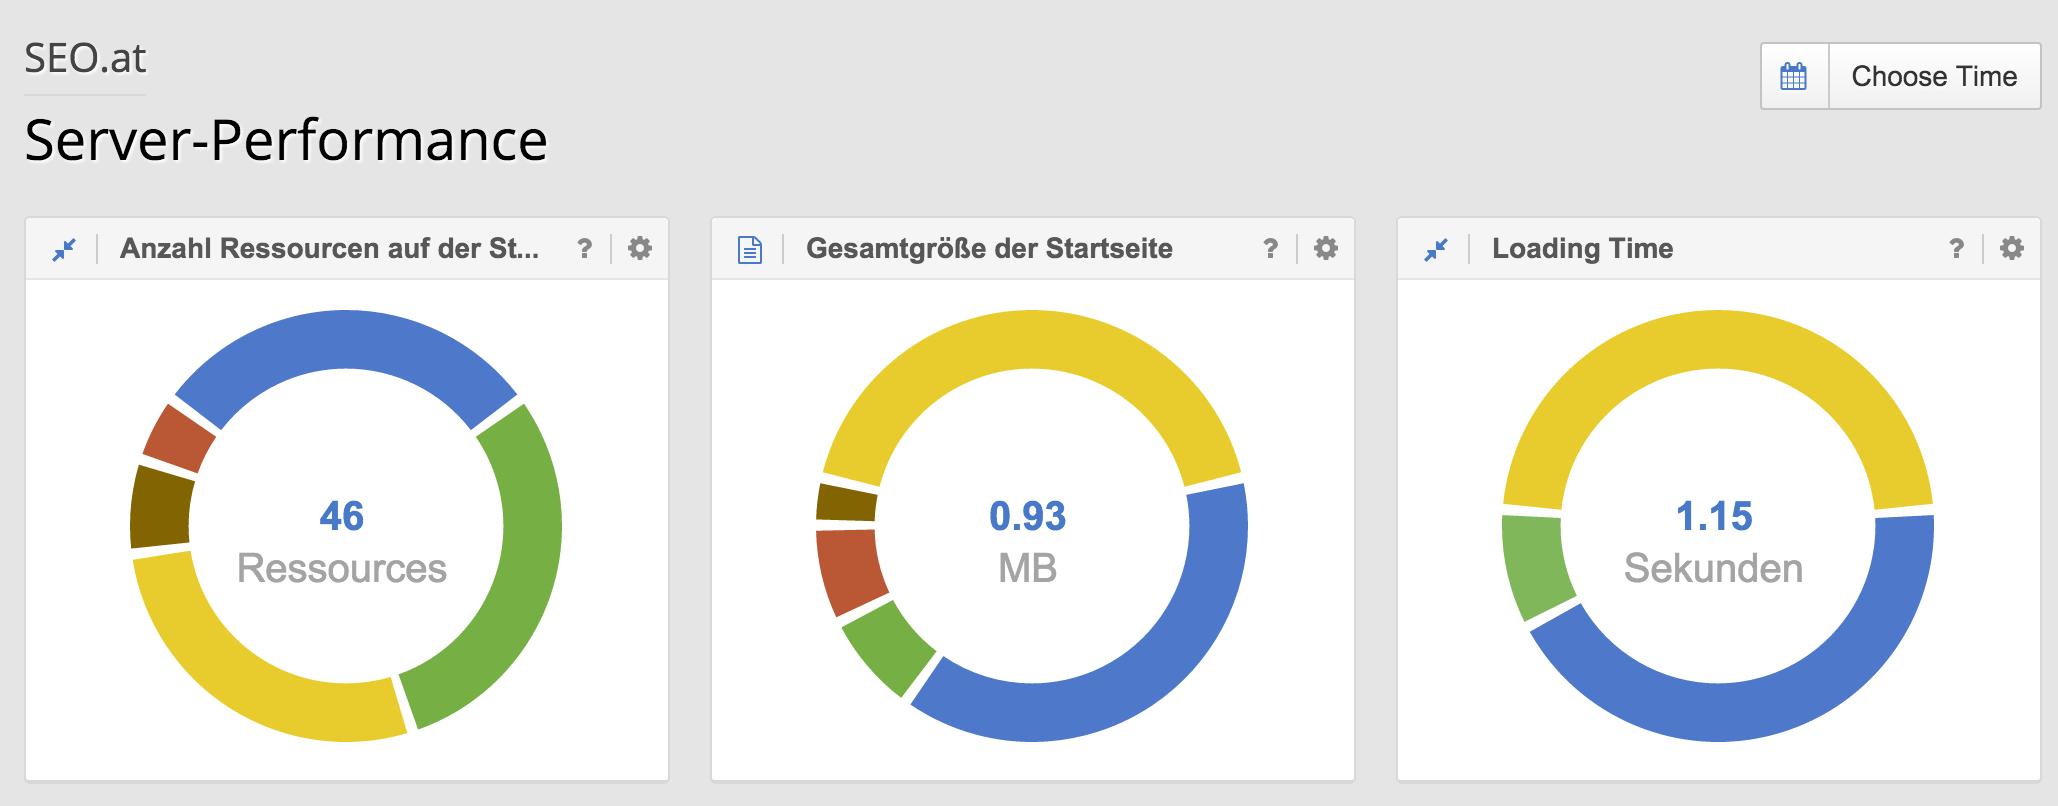 server-performance-summary